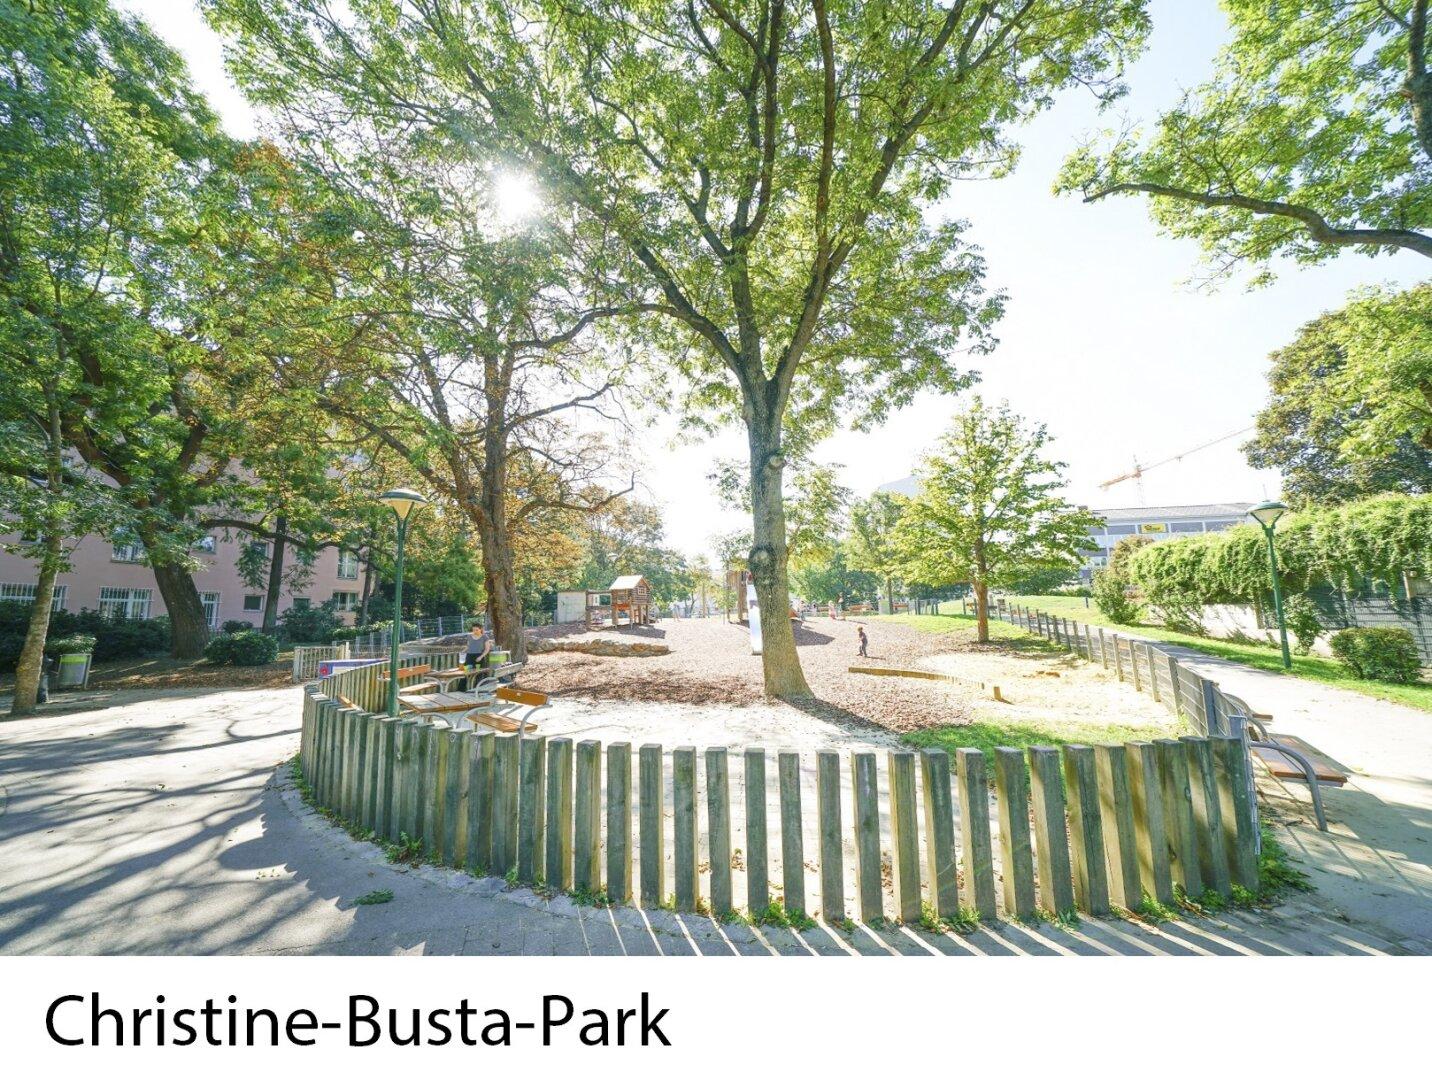 Nahe Christine Busta Park